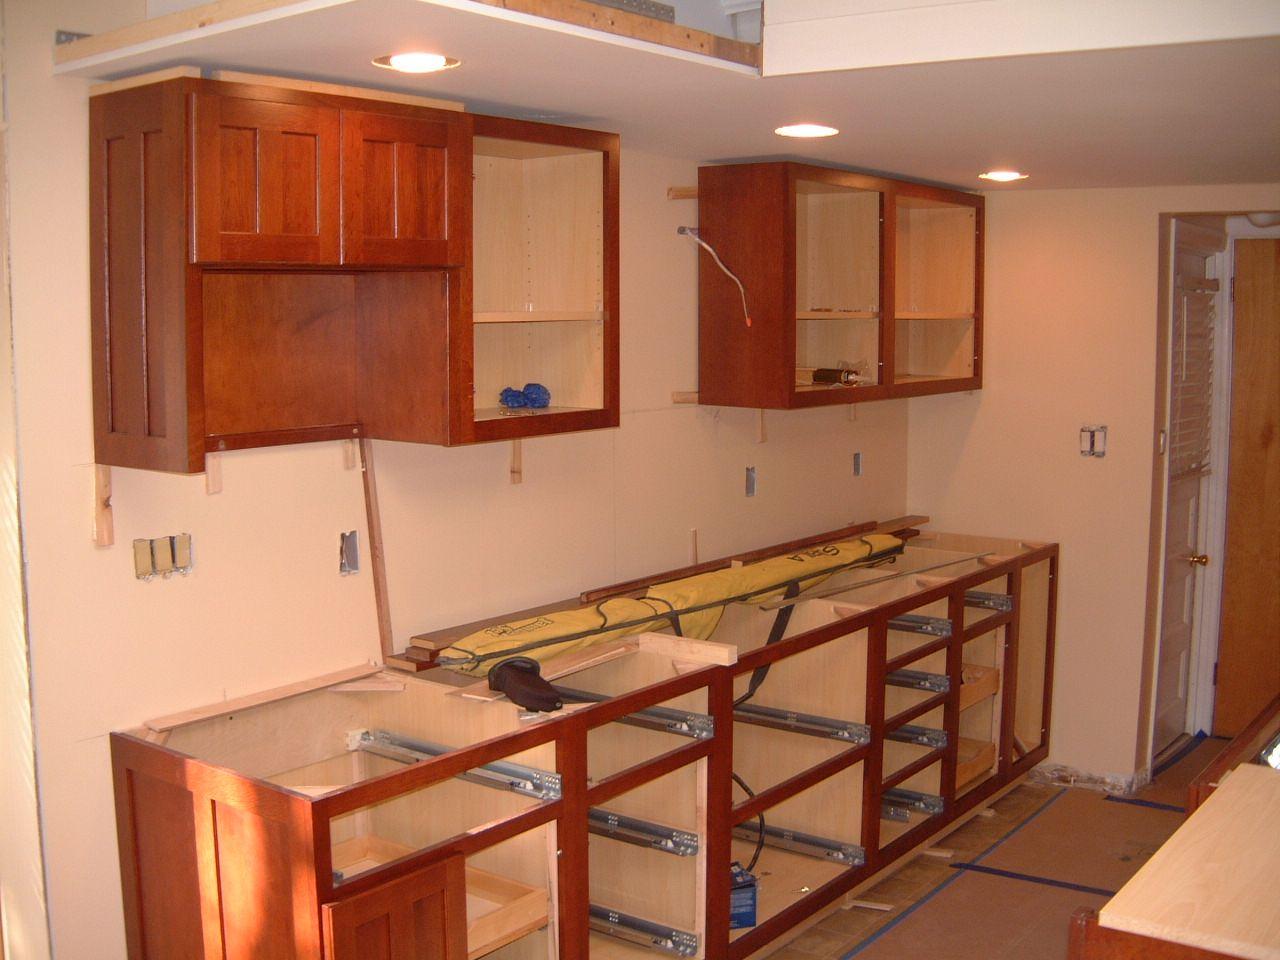 [Springfield Kitchen Cabinet Install Remodeling Designs Inc Installer  Needed Builderscrack] Installing Kitchen Base Cabinets